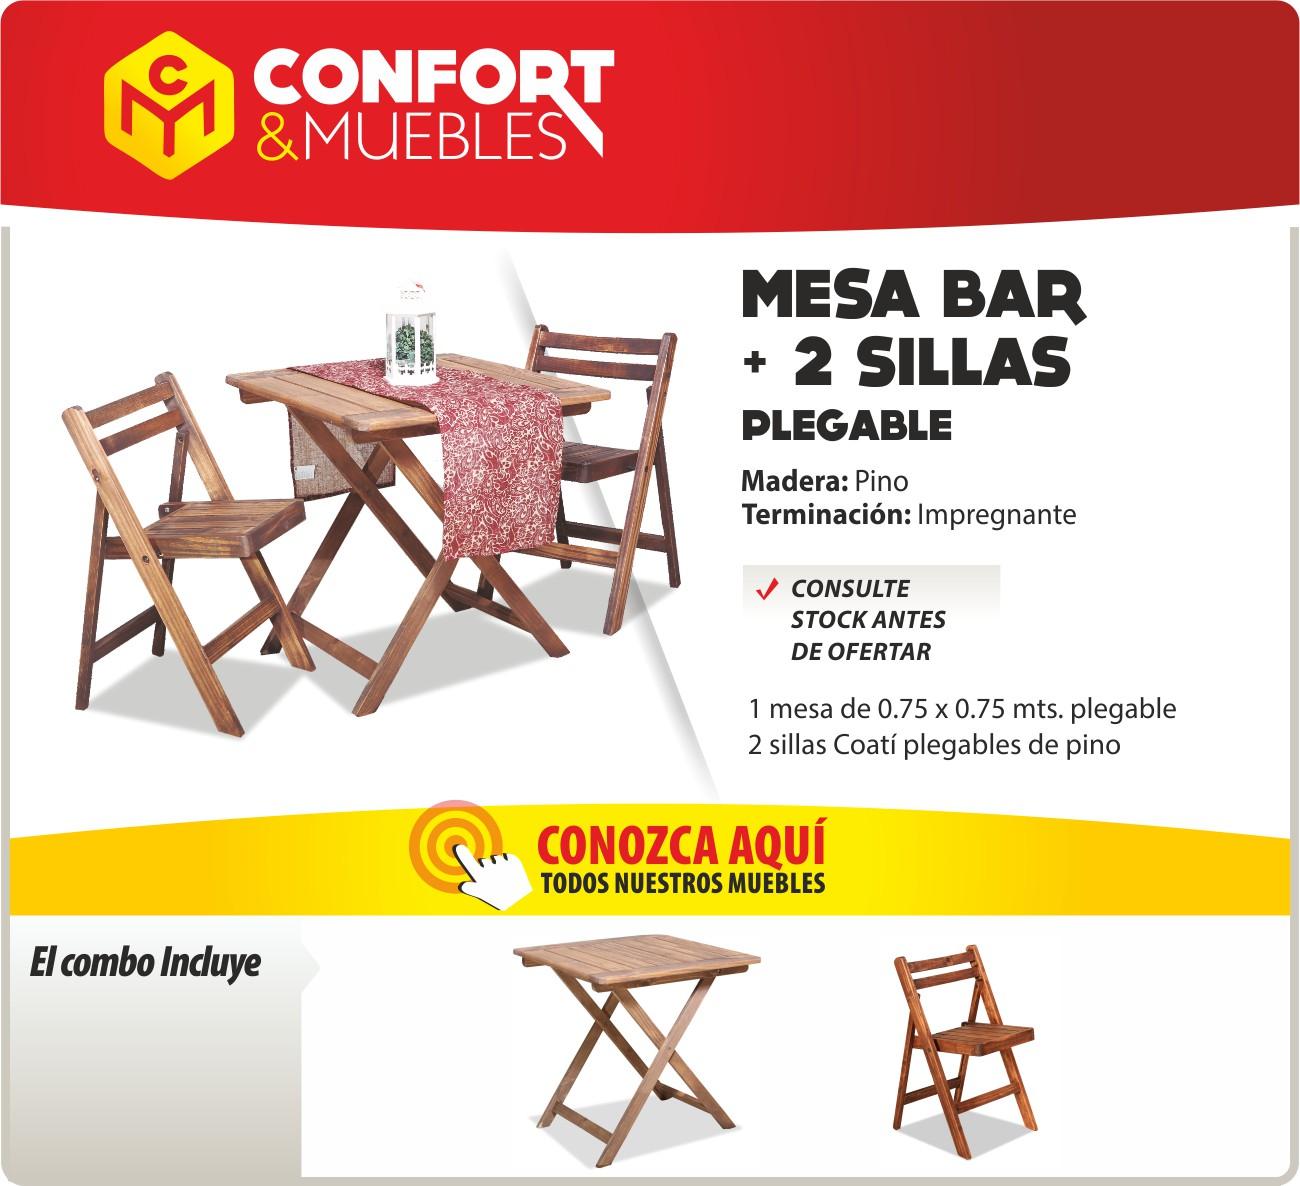 Mesa de madera de pino 75x75 2 sillas plegables confort y muebles - Confort y muebles ...